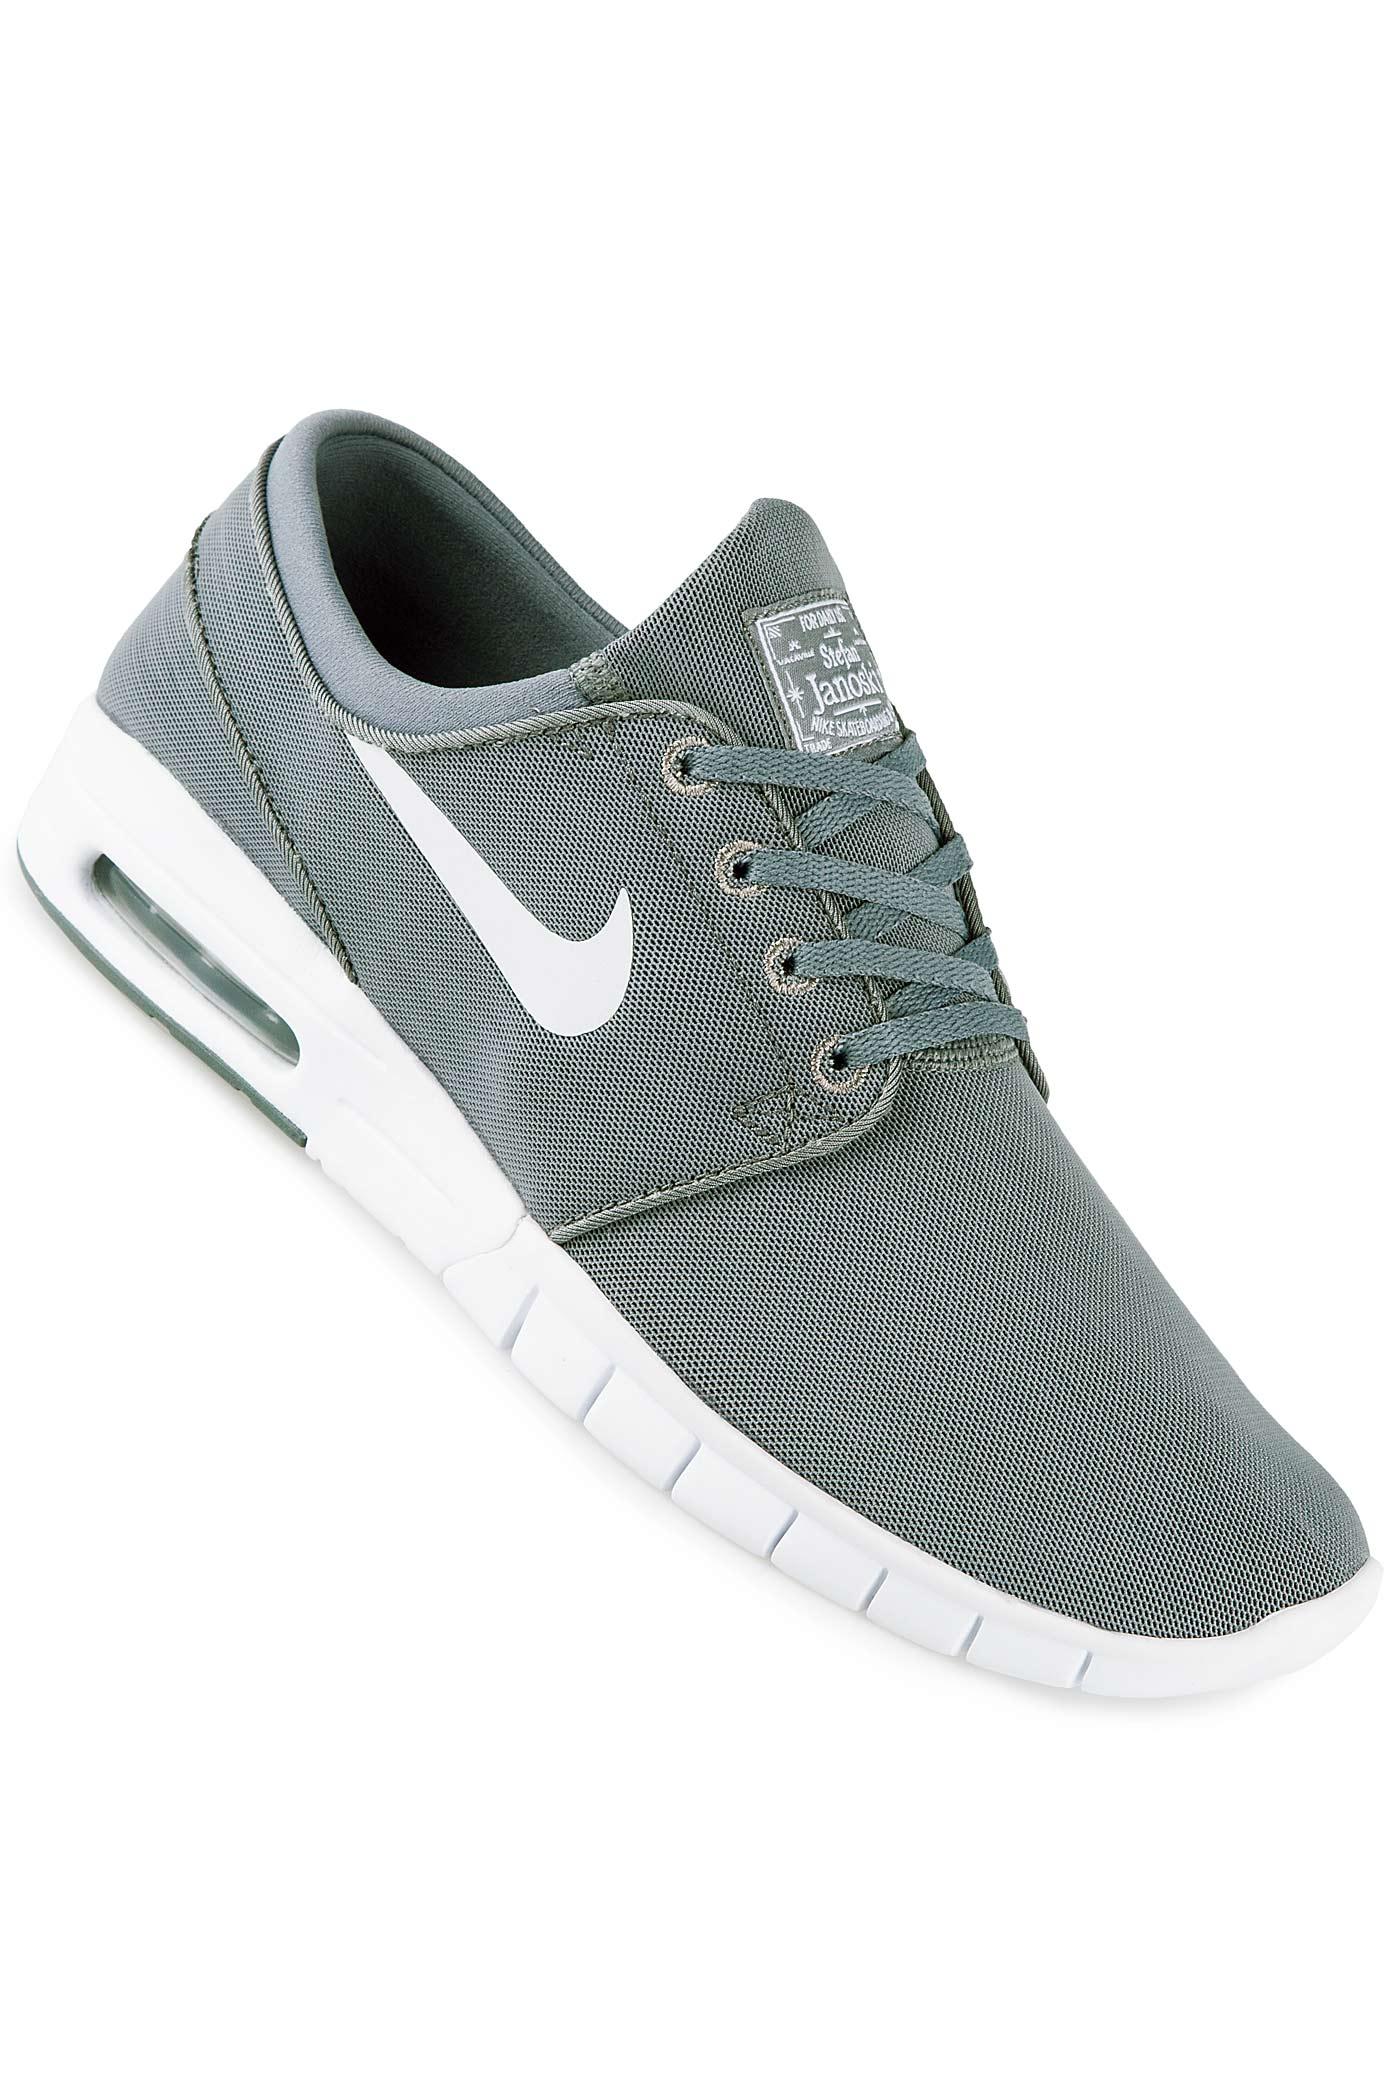 Grey Nike Sb Janoski Shoe